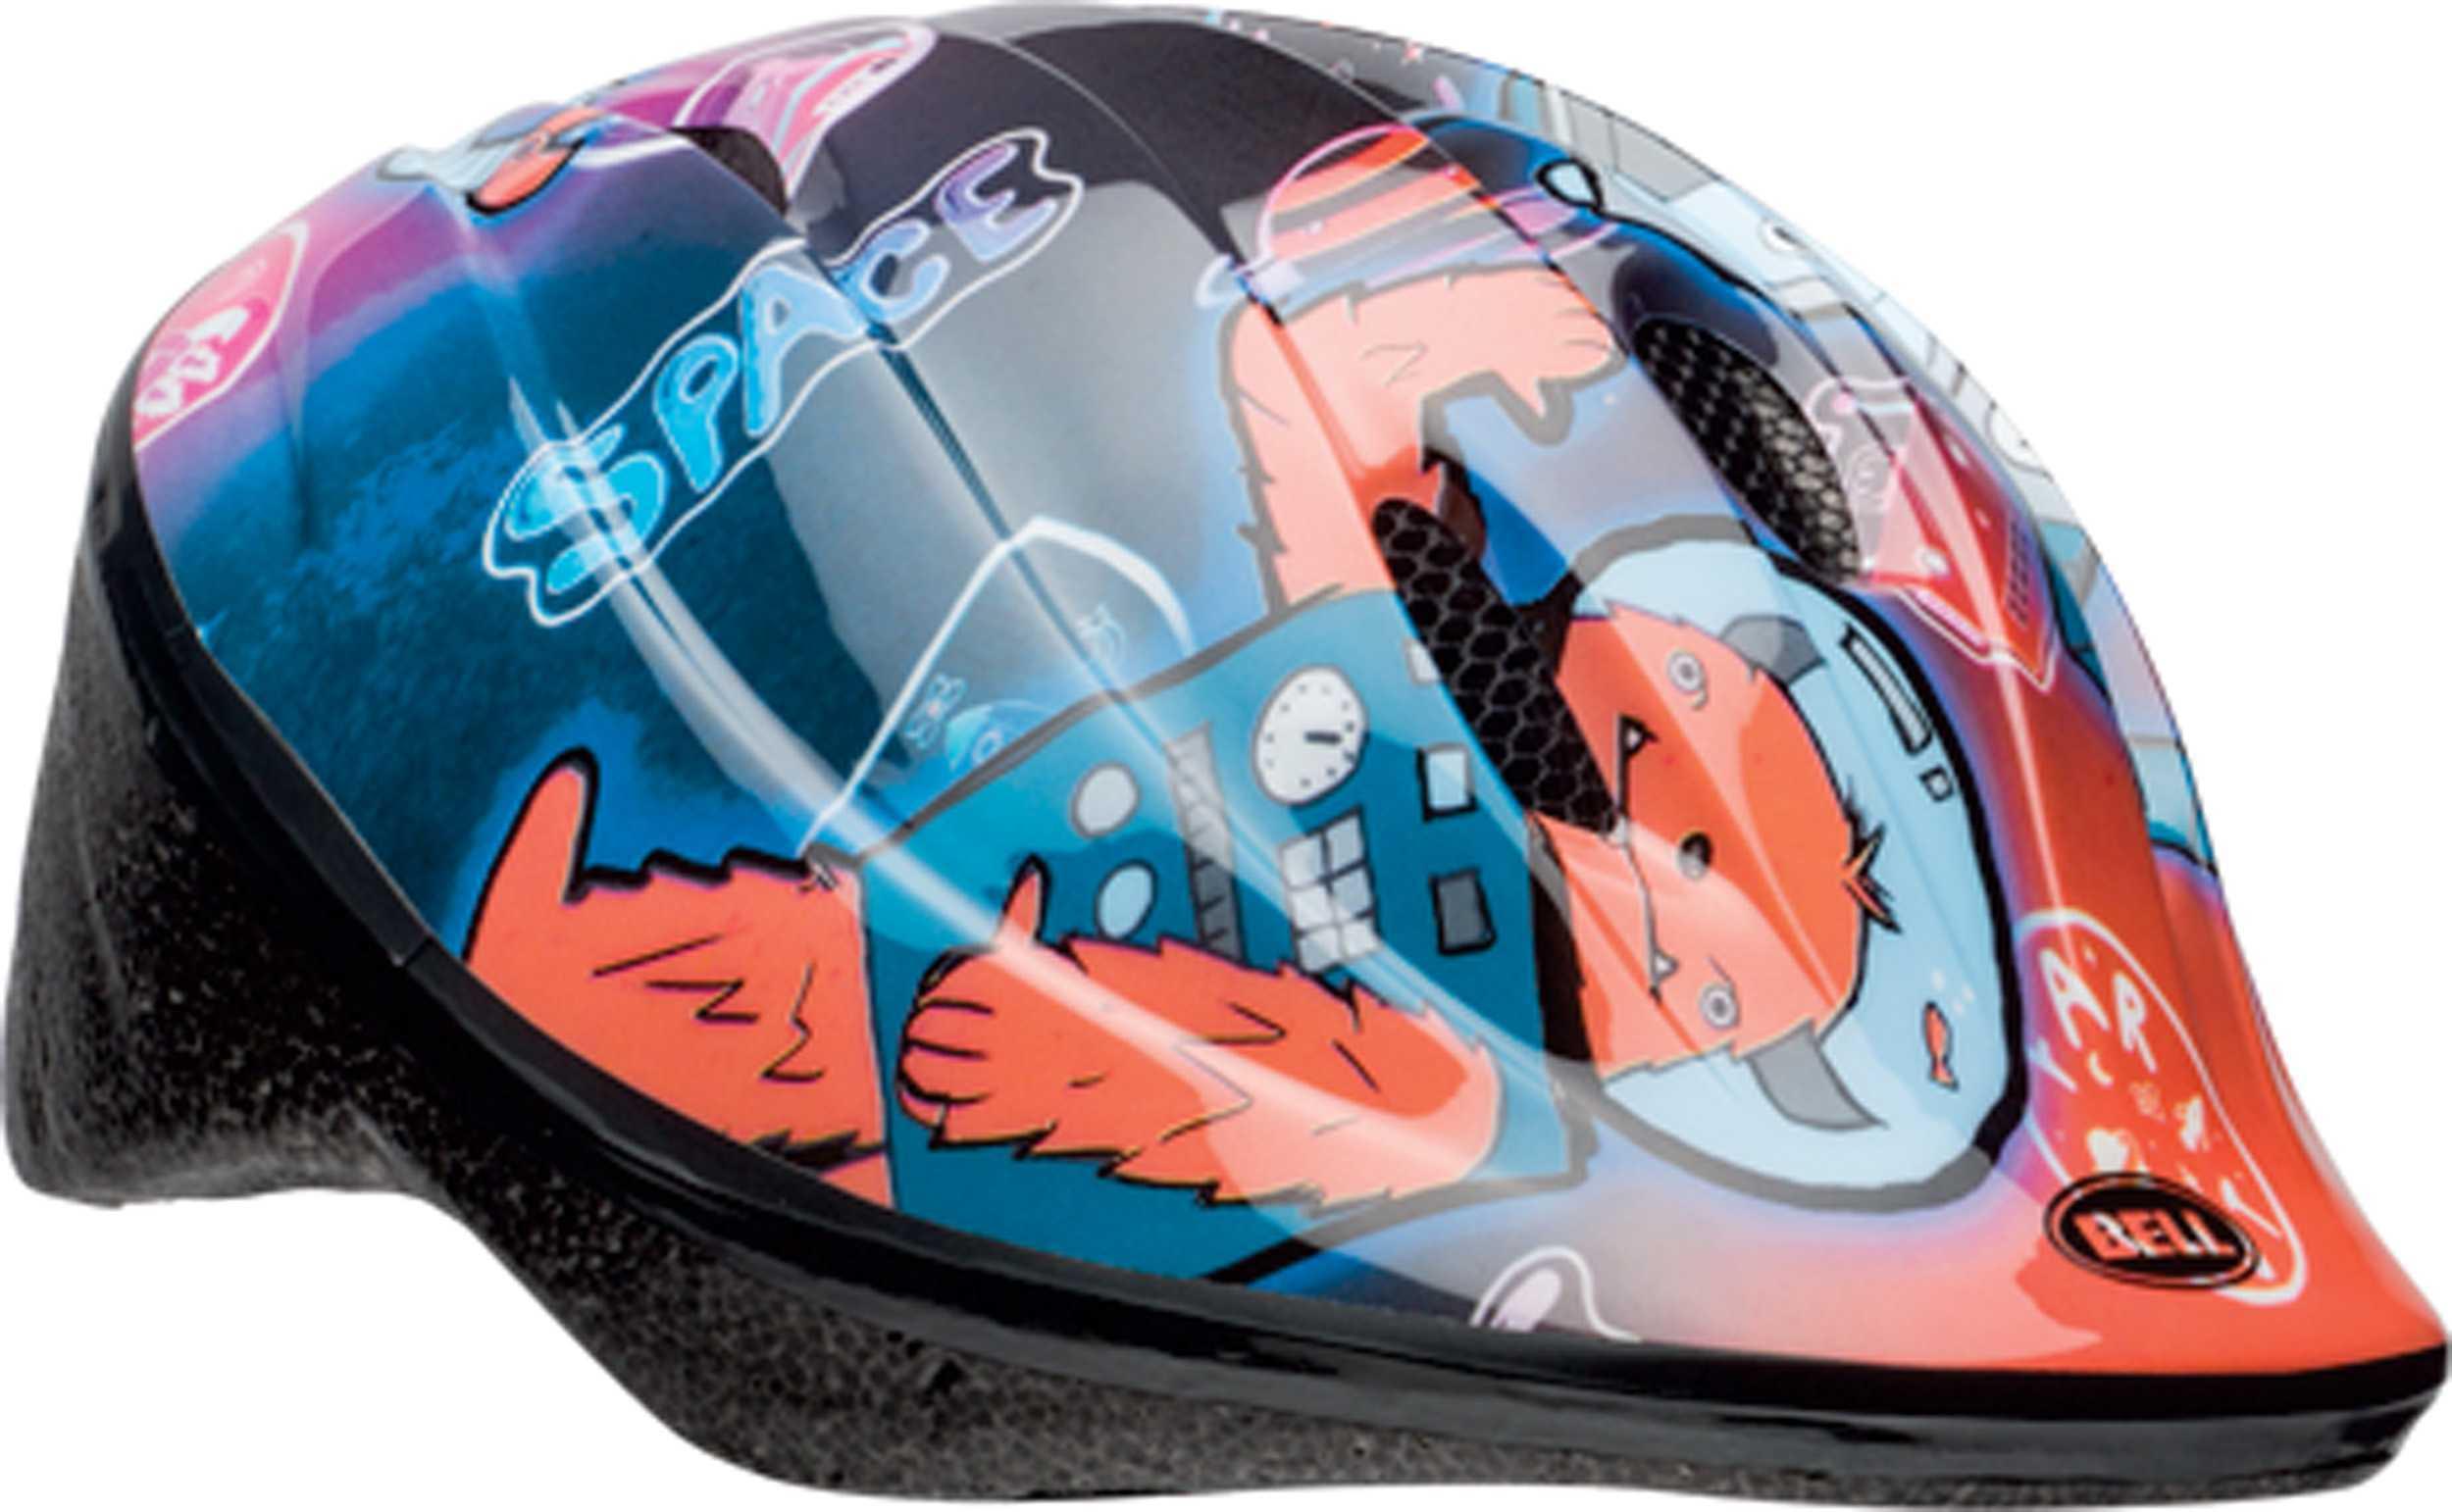 Bell Bellino Kids Helmet 2018   Helmets